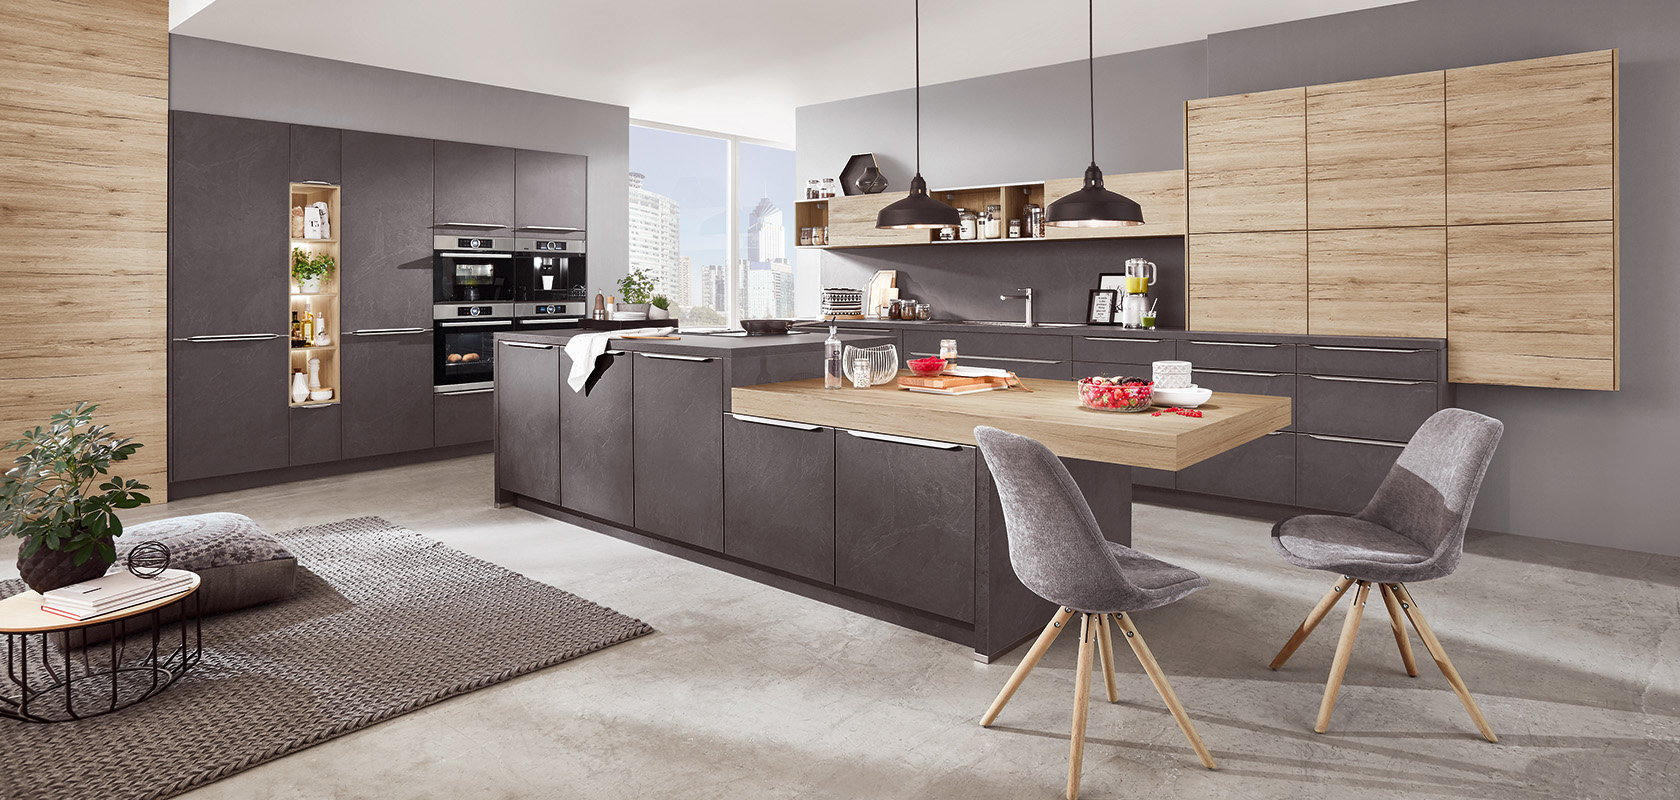 Parallel design keuken - Nobilia StoneArt 303 leisteen grijs